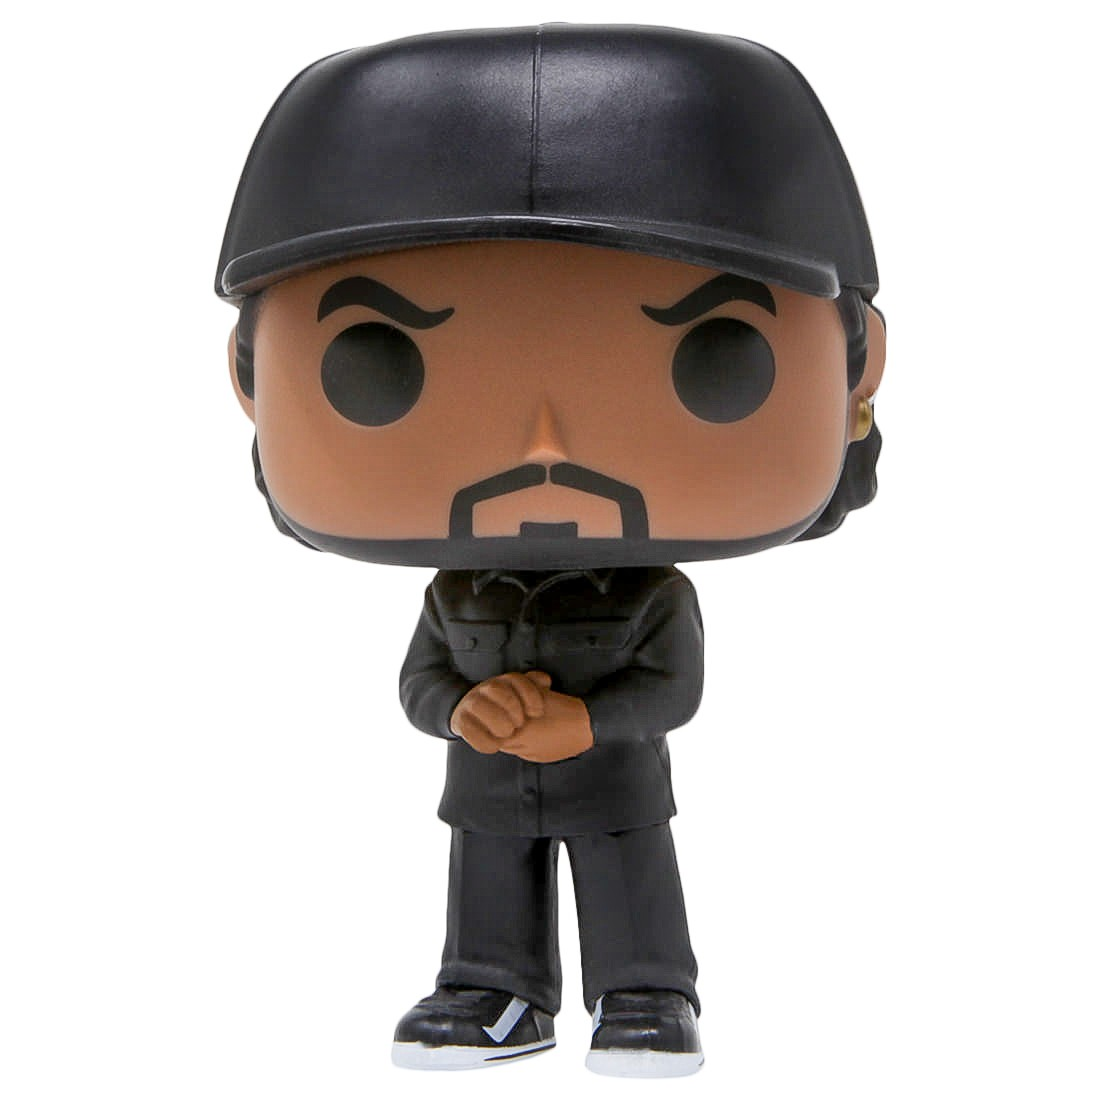 Funko POP Rocks Ice Cube (black)